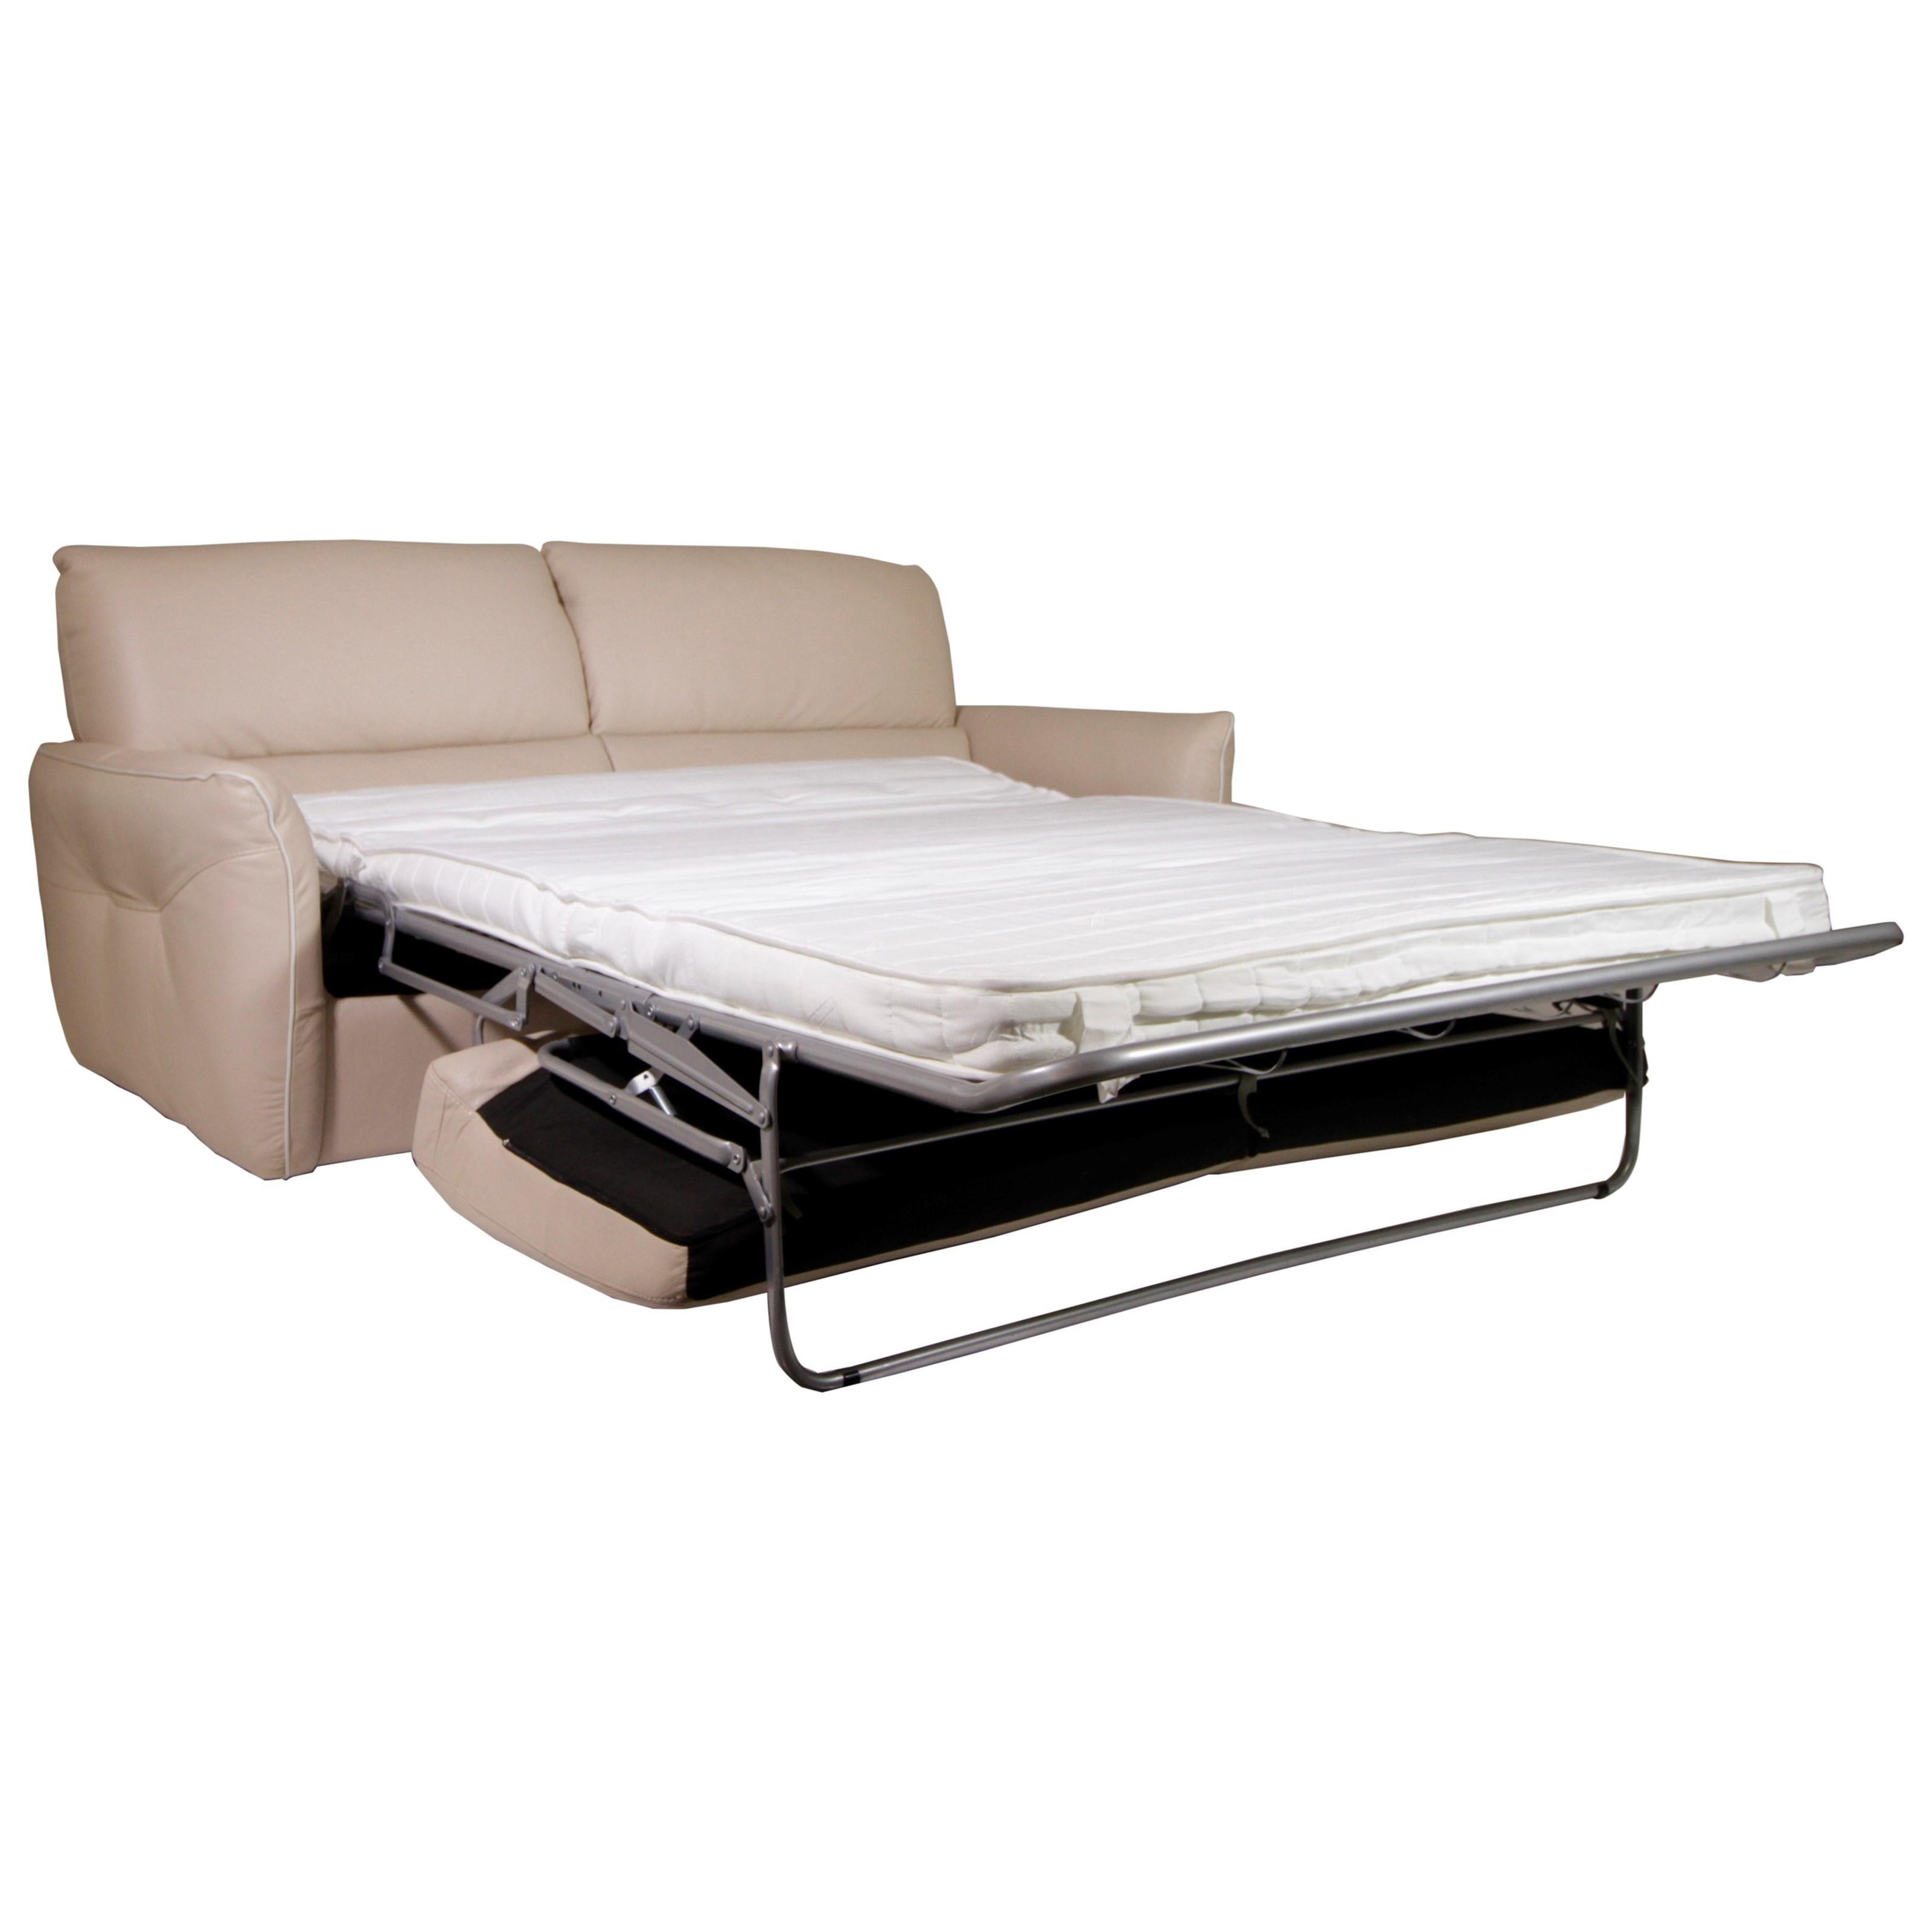 Natuzzi Sofa Sleeper: Natuzzi Editions B842 Modern Sofa Sleeper